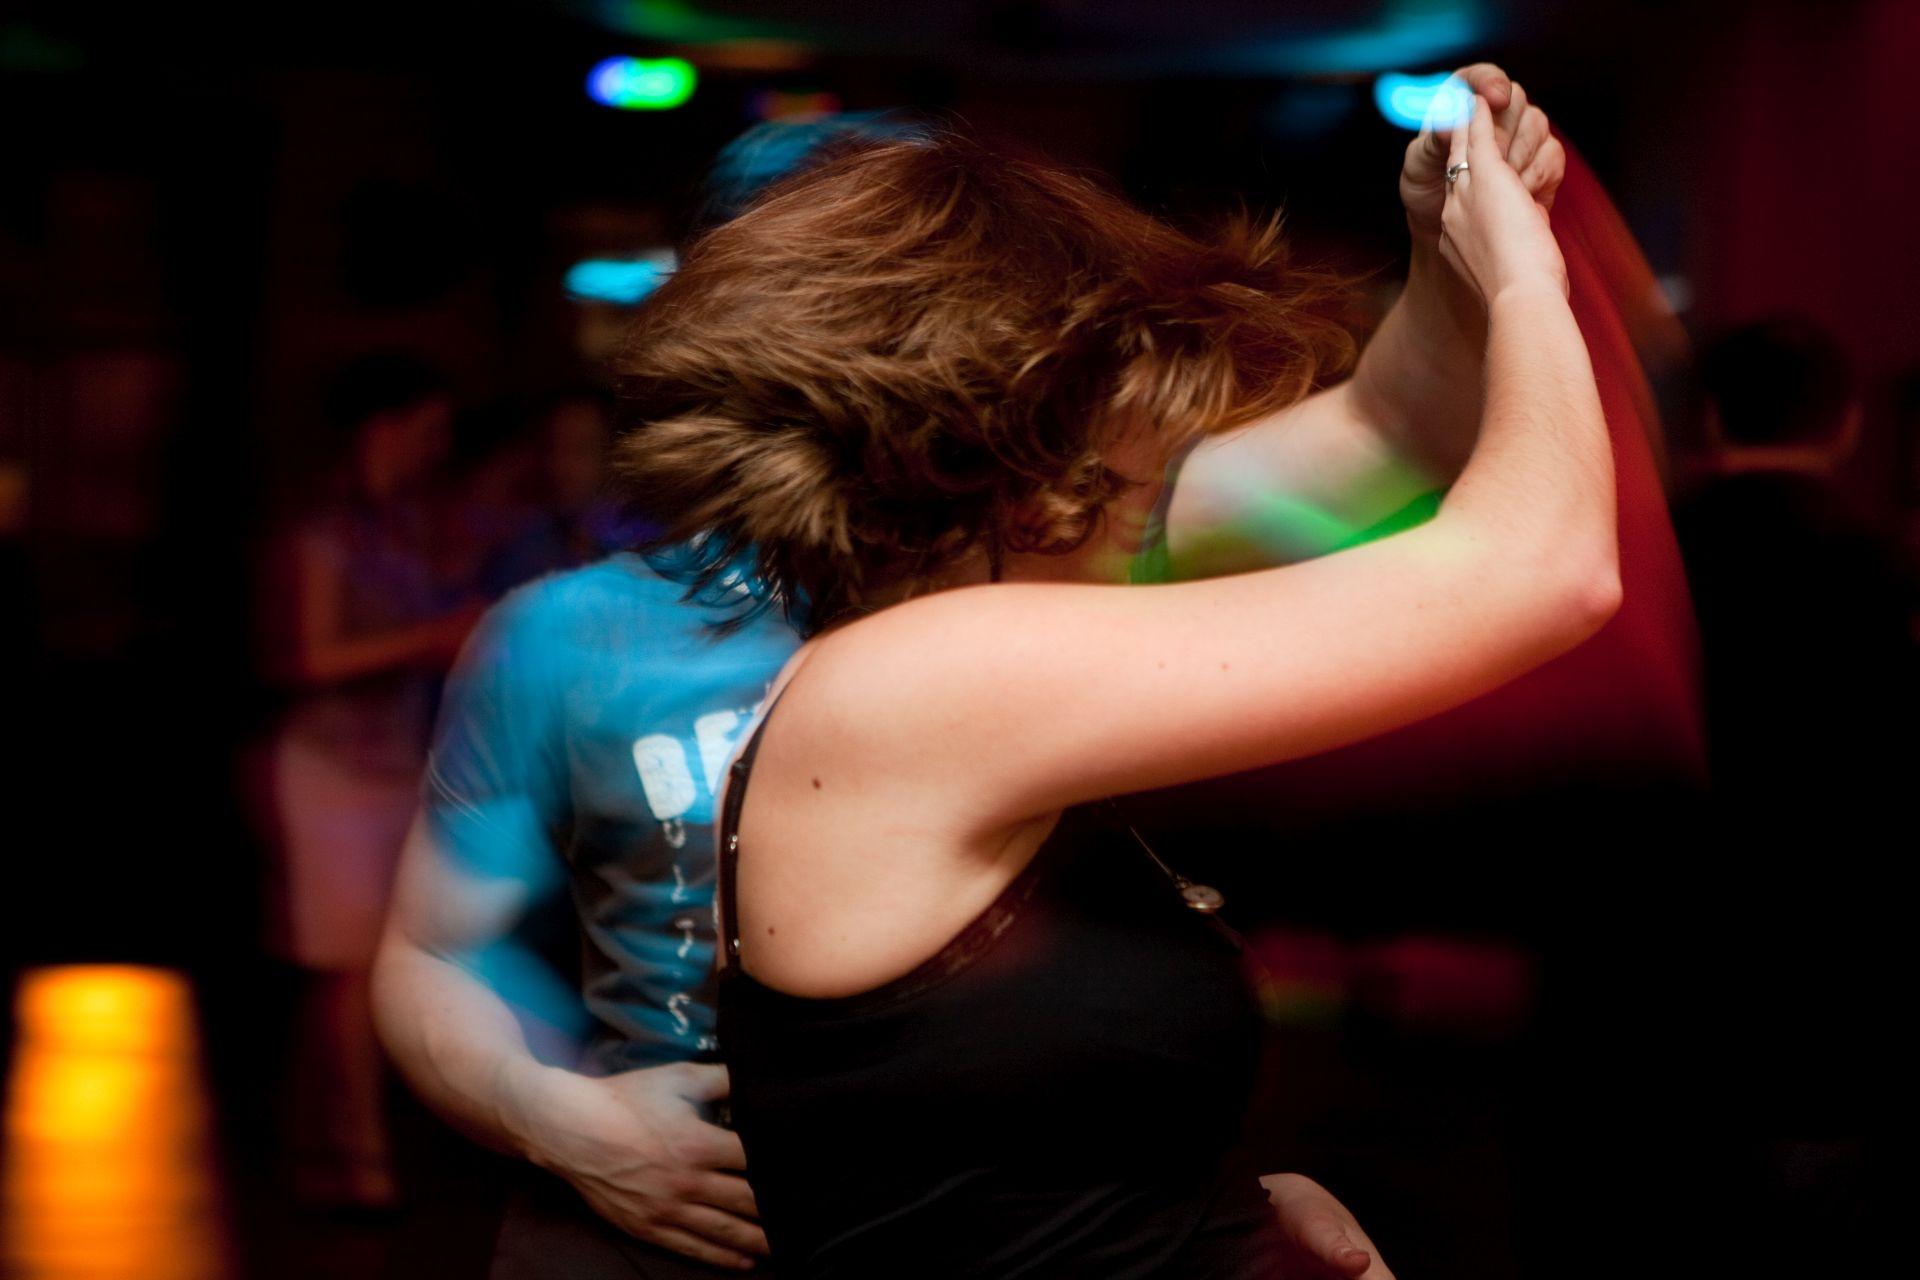 E1 Concert en feest Dansen bij Kluver-12